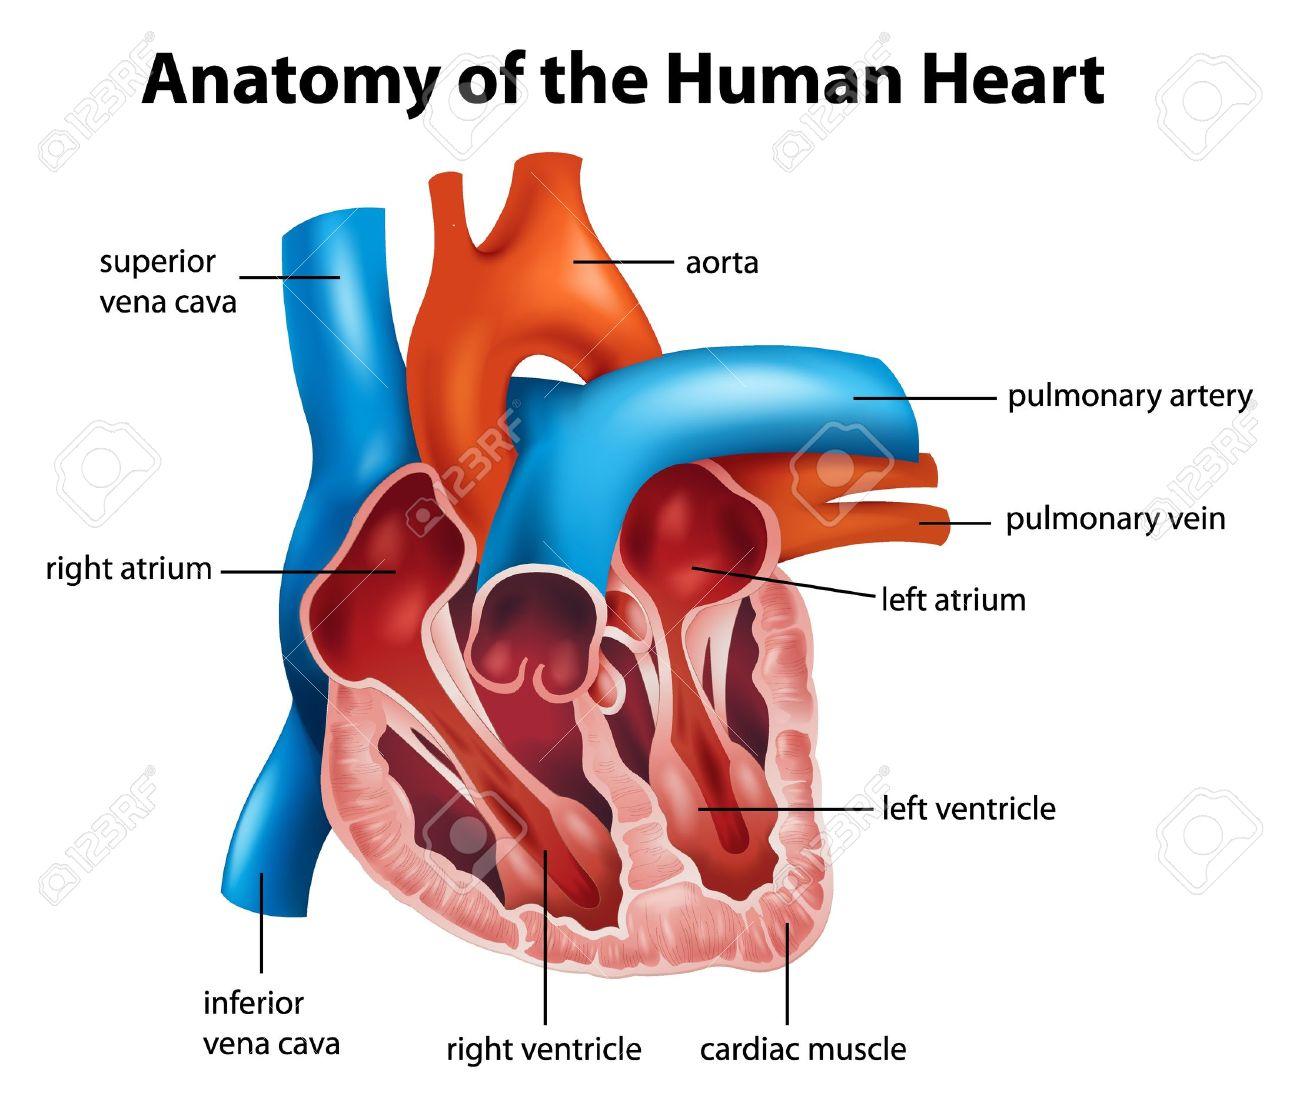 Anatomy of the human heart illustration royalty free cliparts anatomy of the human heart illustration imagens 16988137 ccuart Choice Image